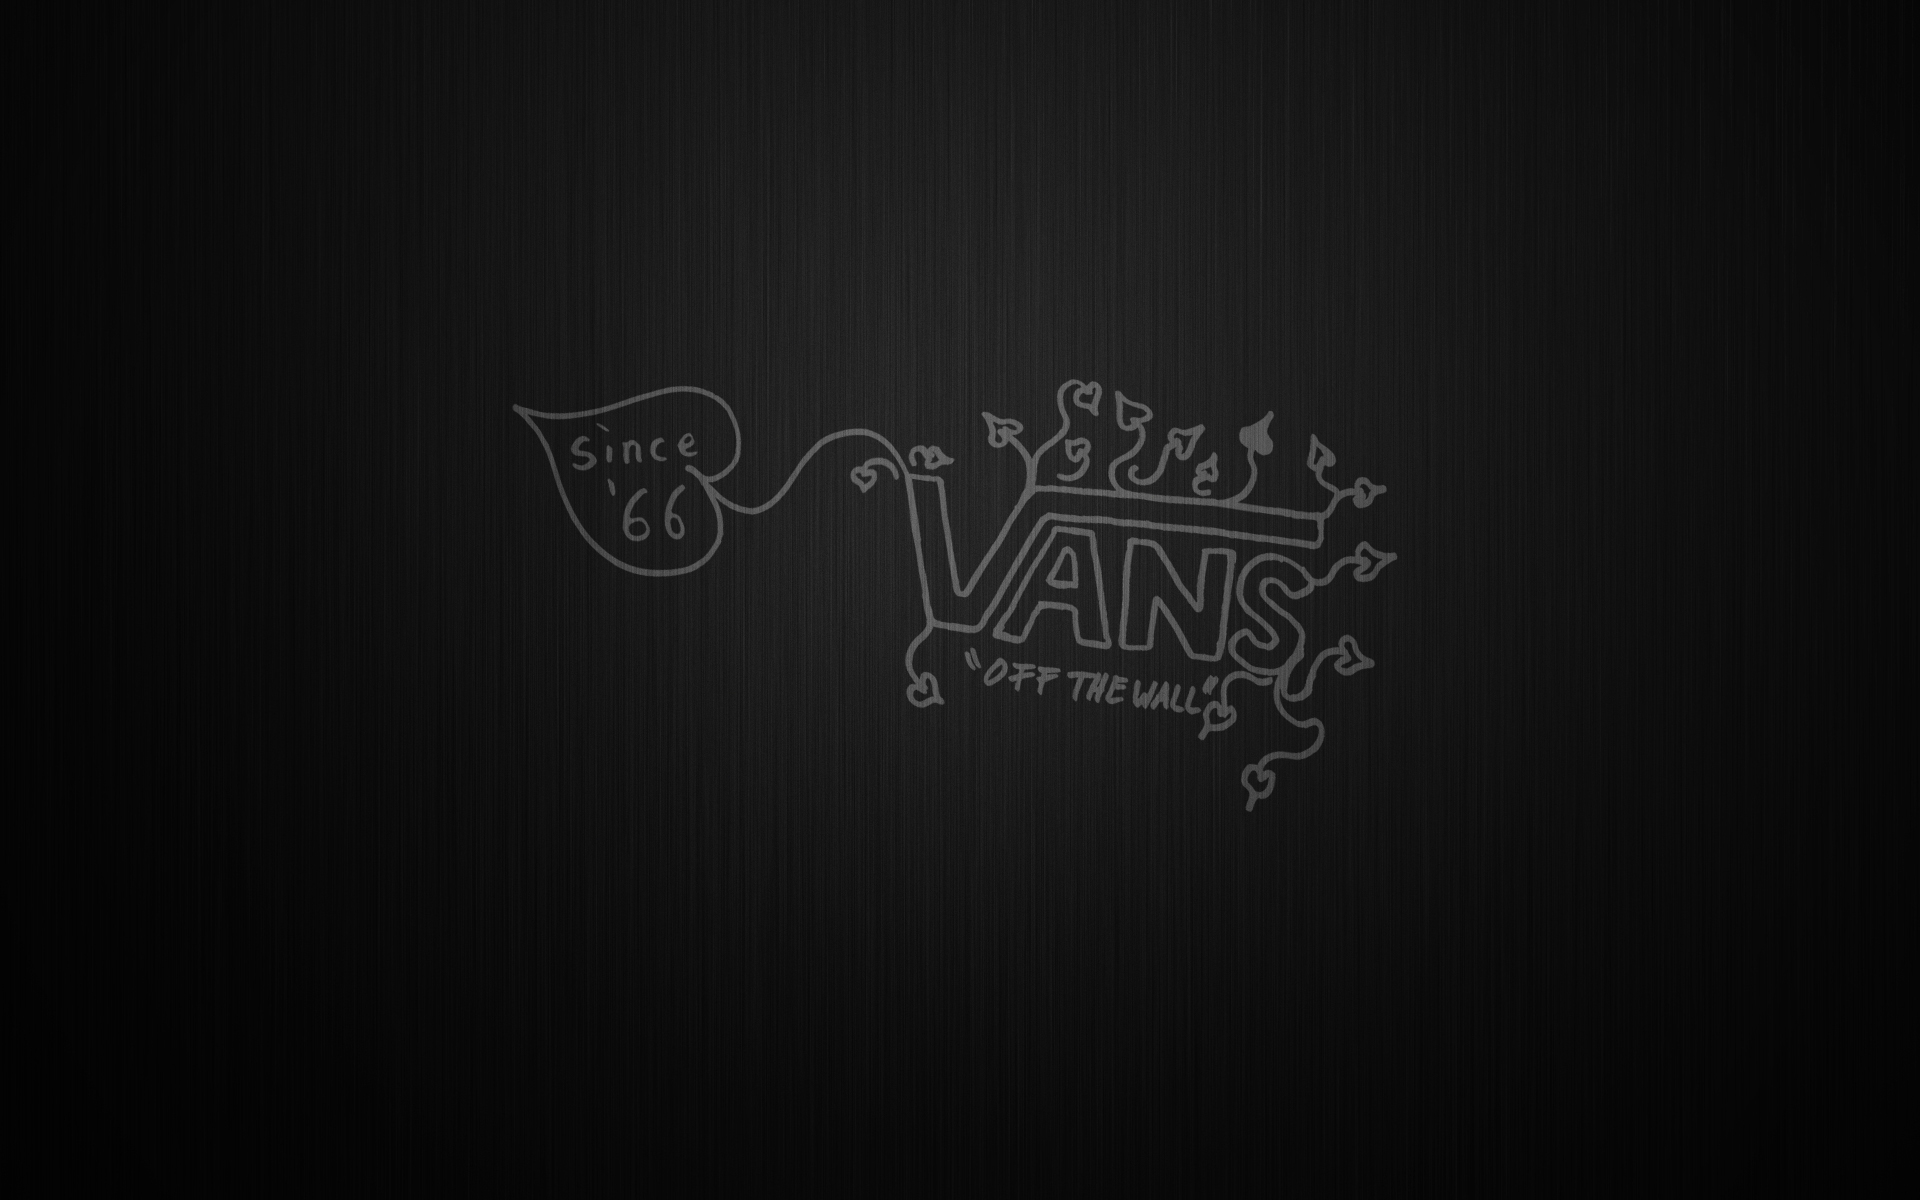 Best Logos Wallpaper Vans 912314 Logos 1920x1200